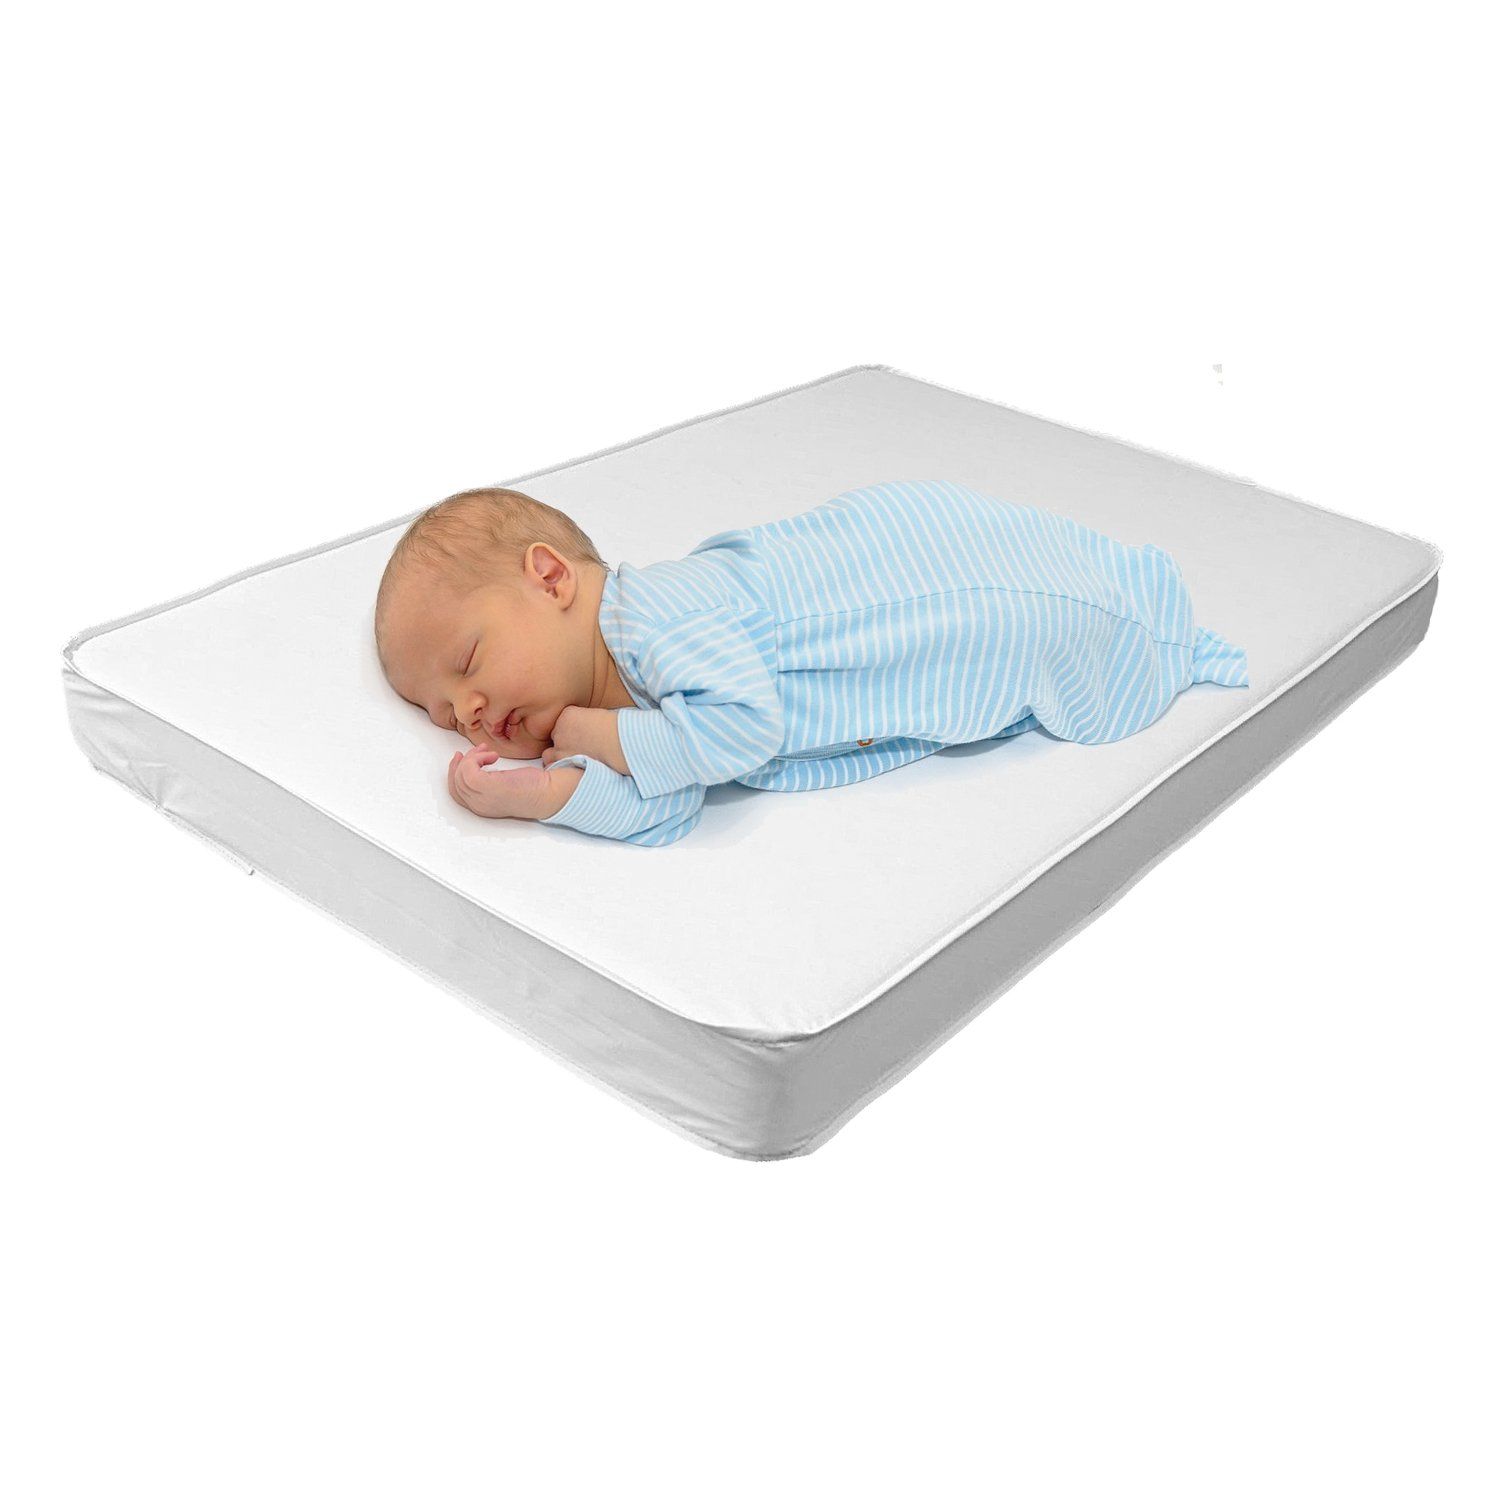 Babydoll Bedding Bassinet Mattress - Size: 13x29x2, white 009243064848